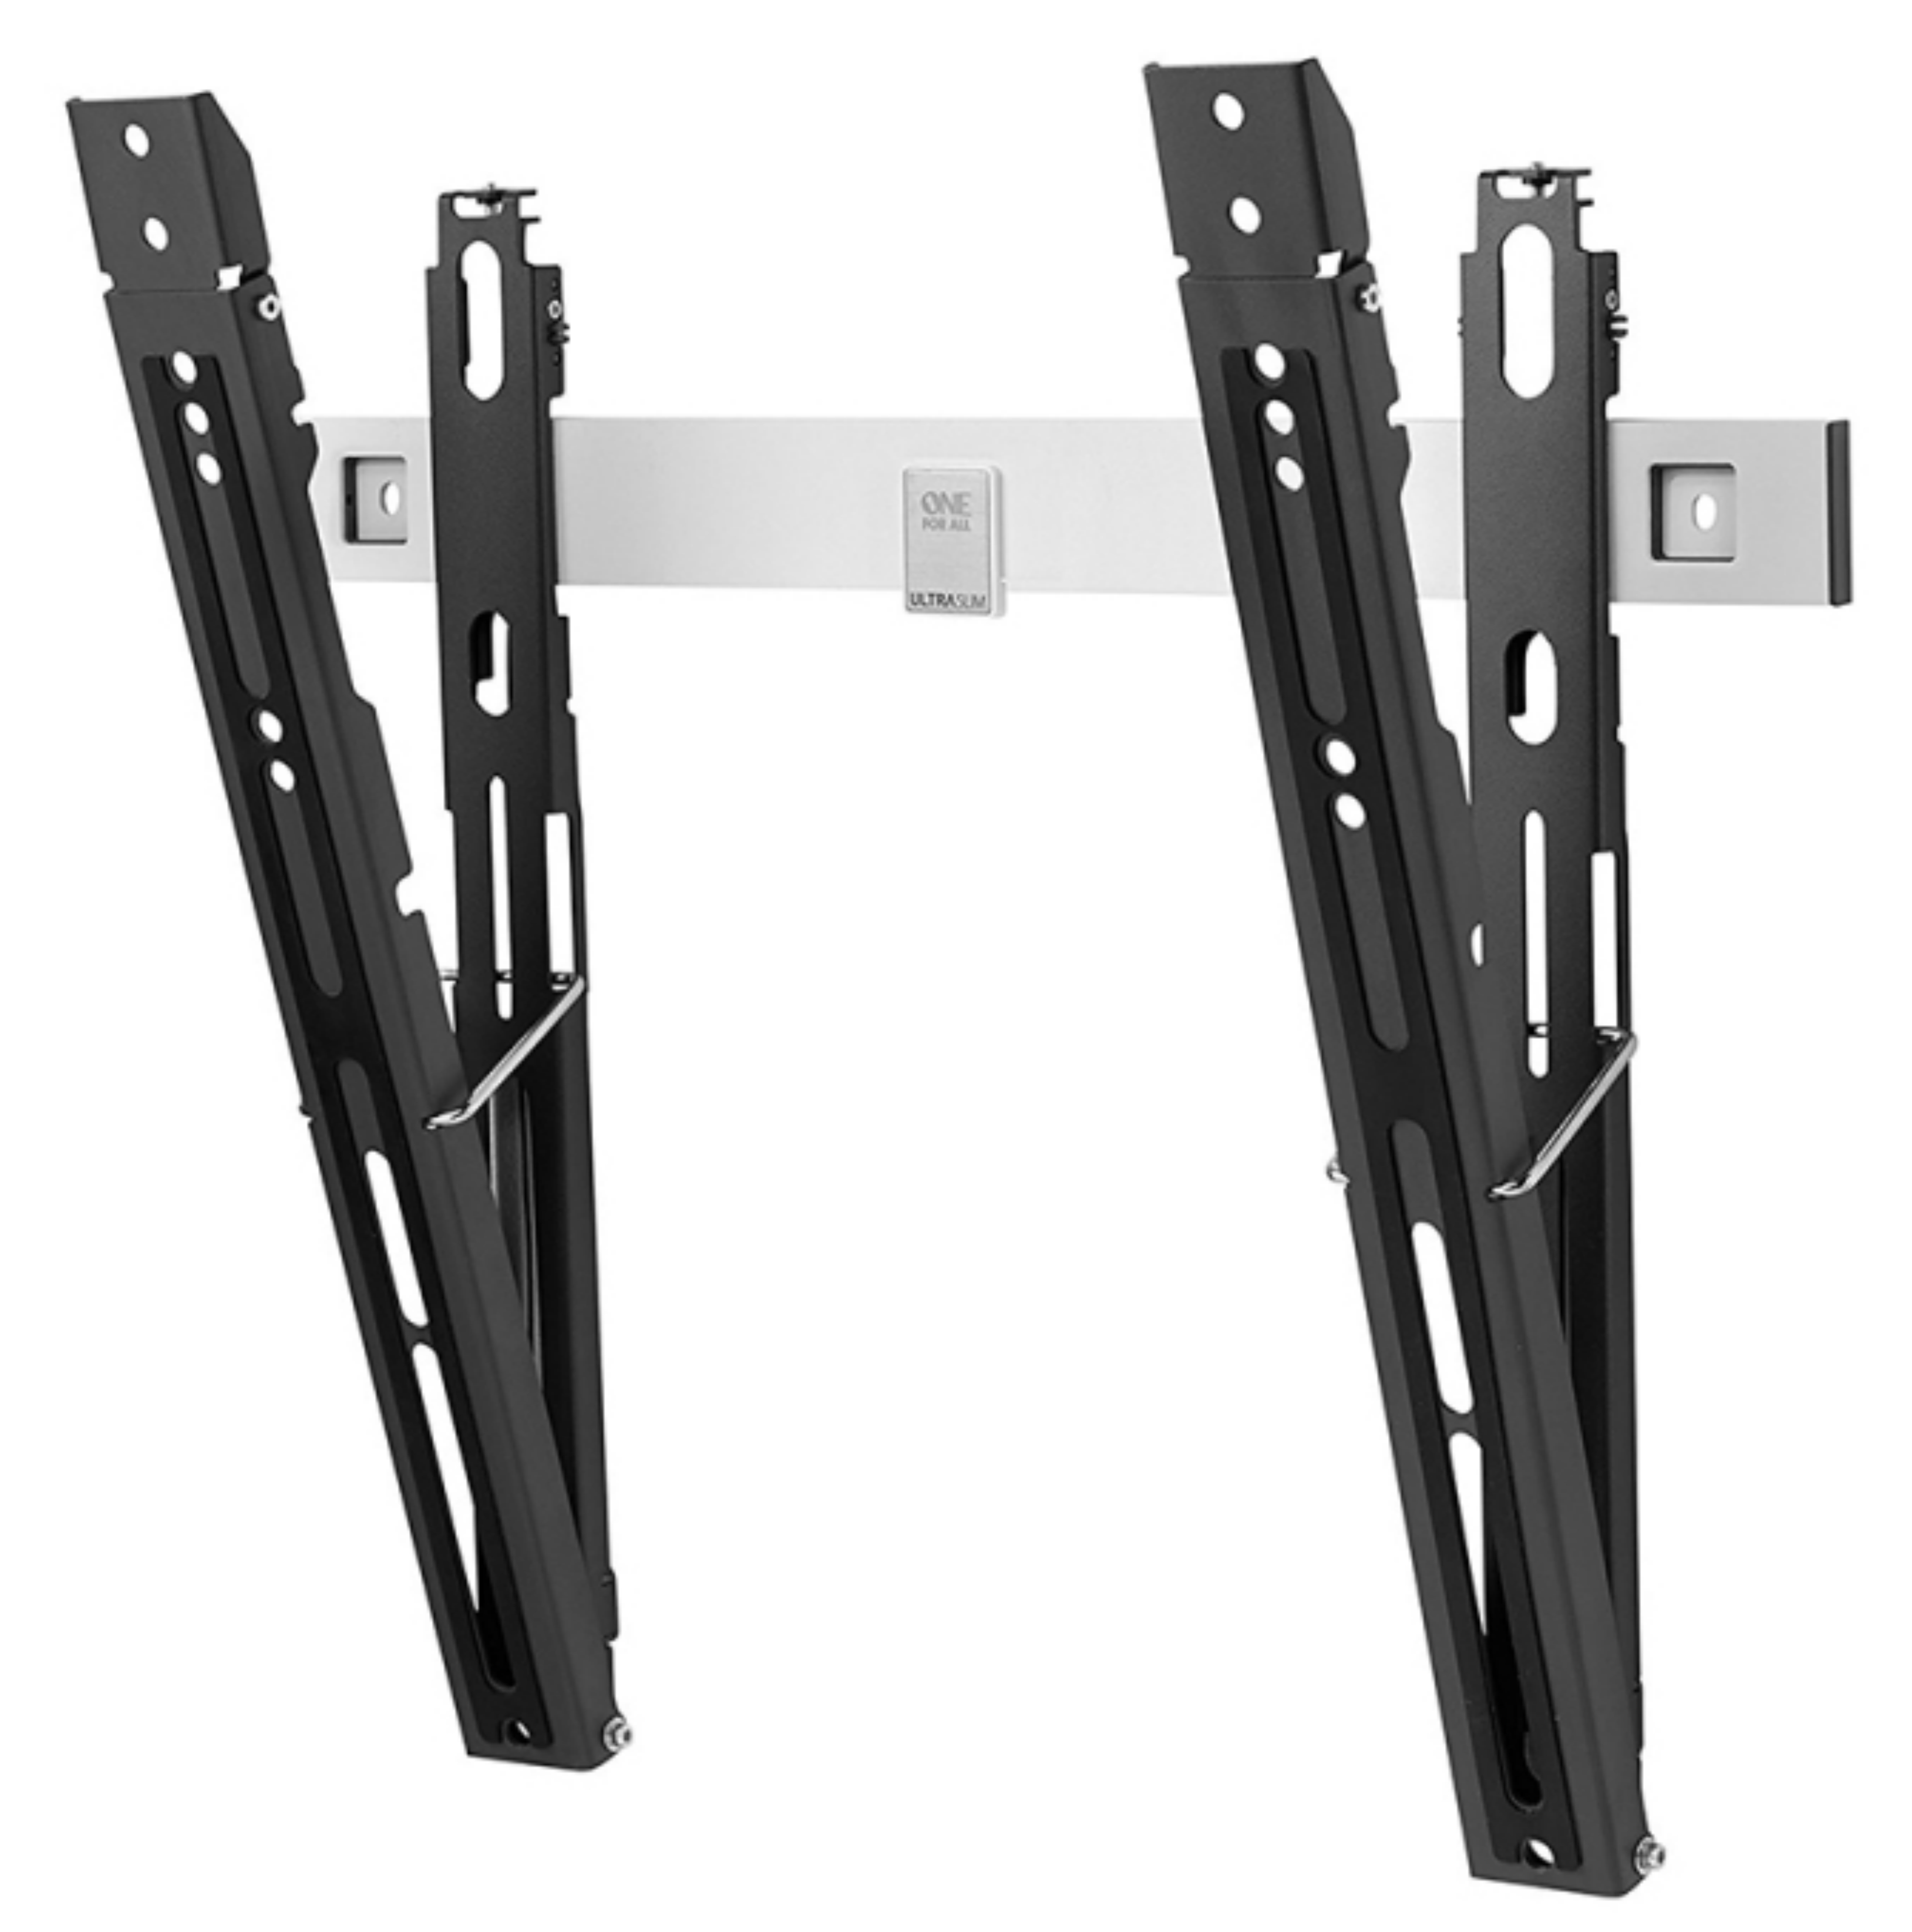 One For All WM6421 TV Bracket|Wall Mount|Tilt|Ultra Slim Series|32-60 inch|New|